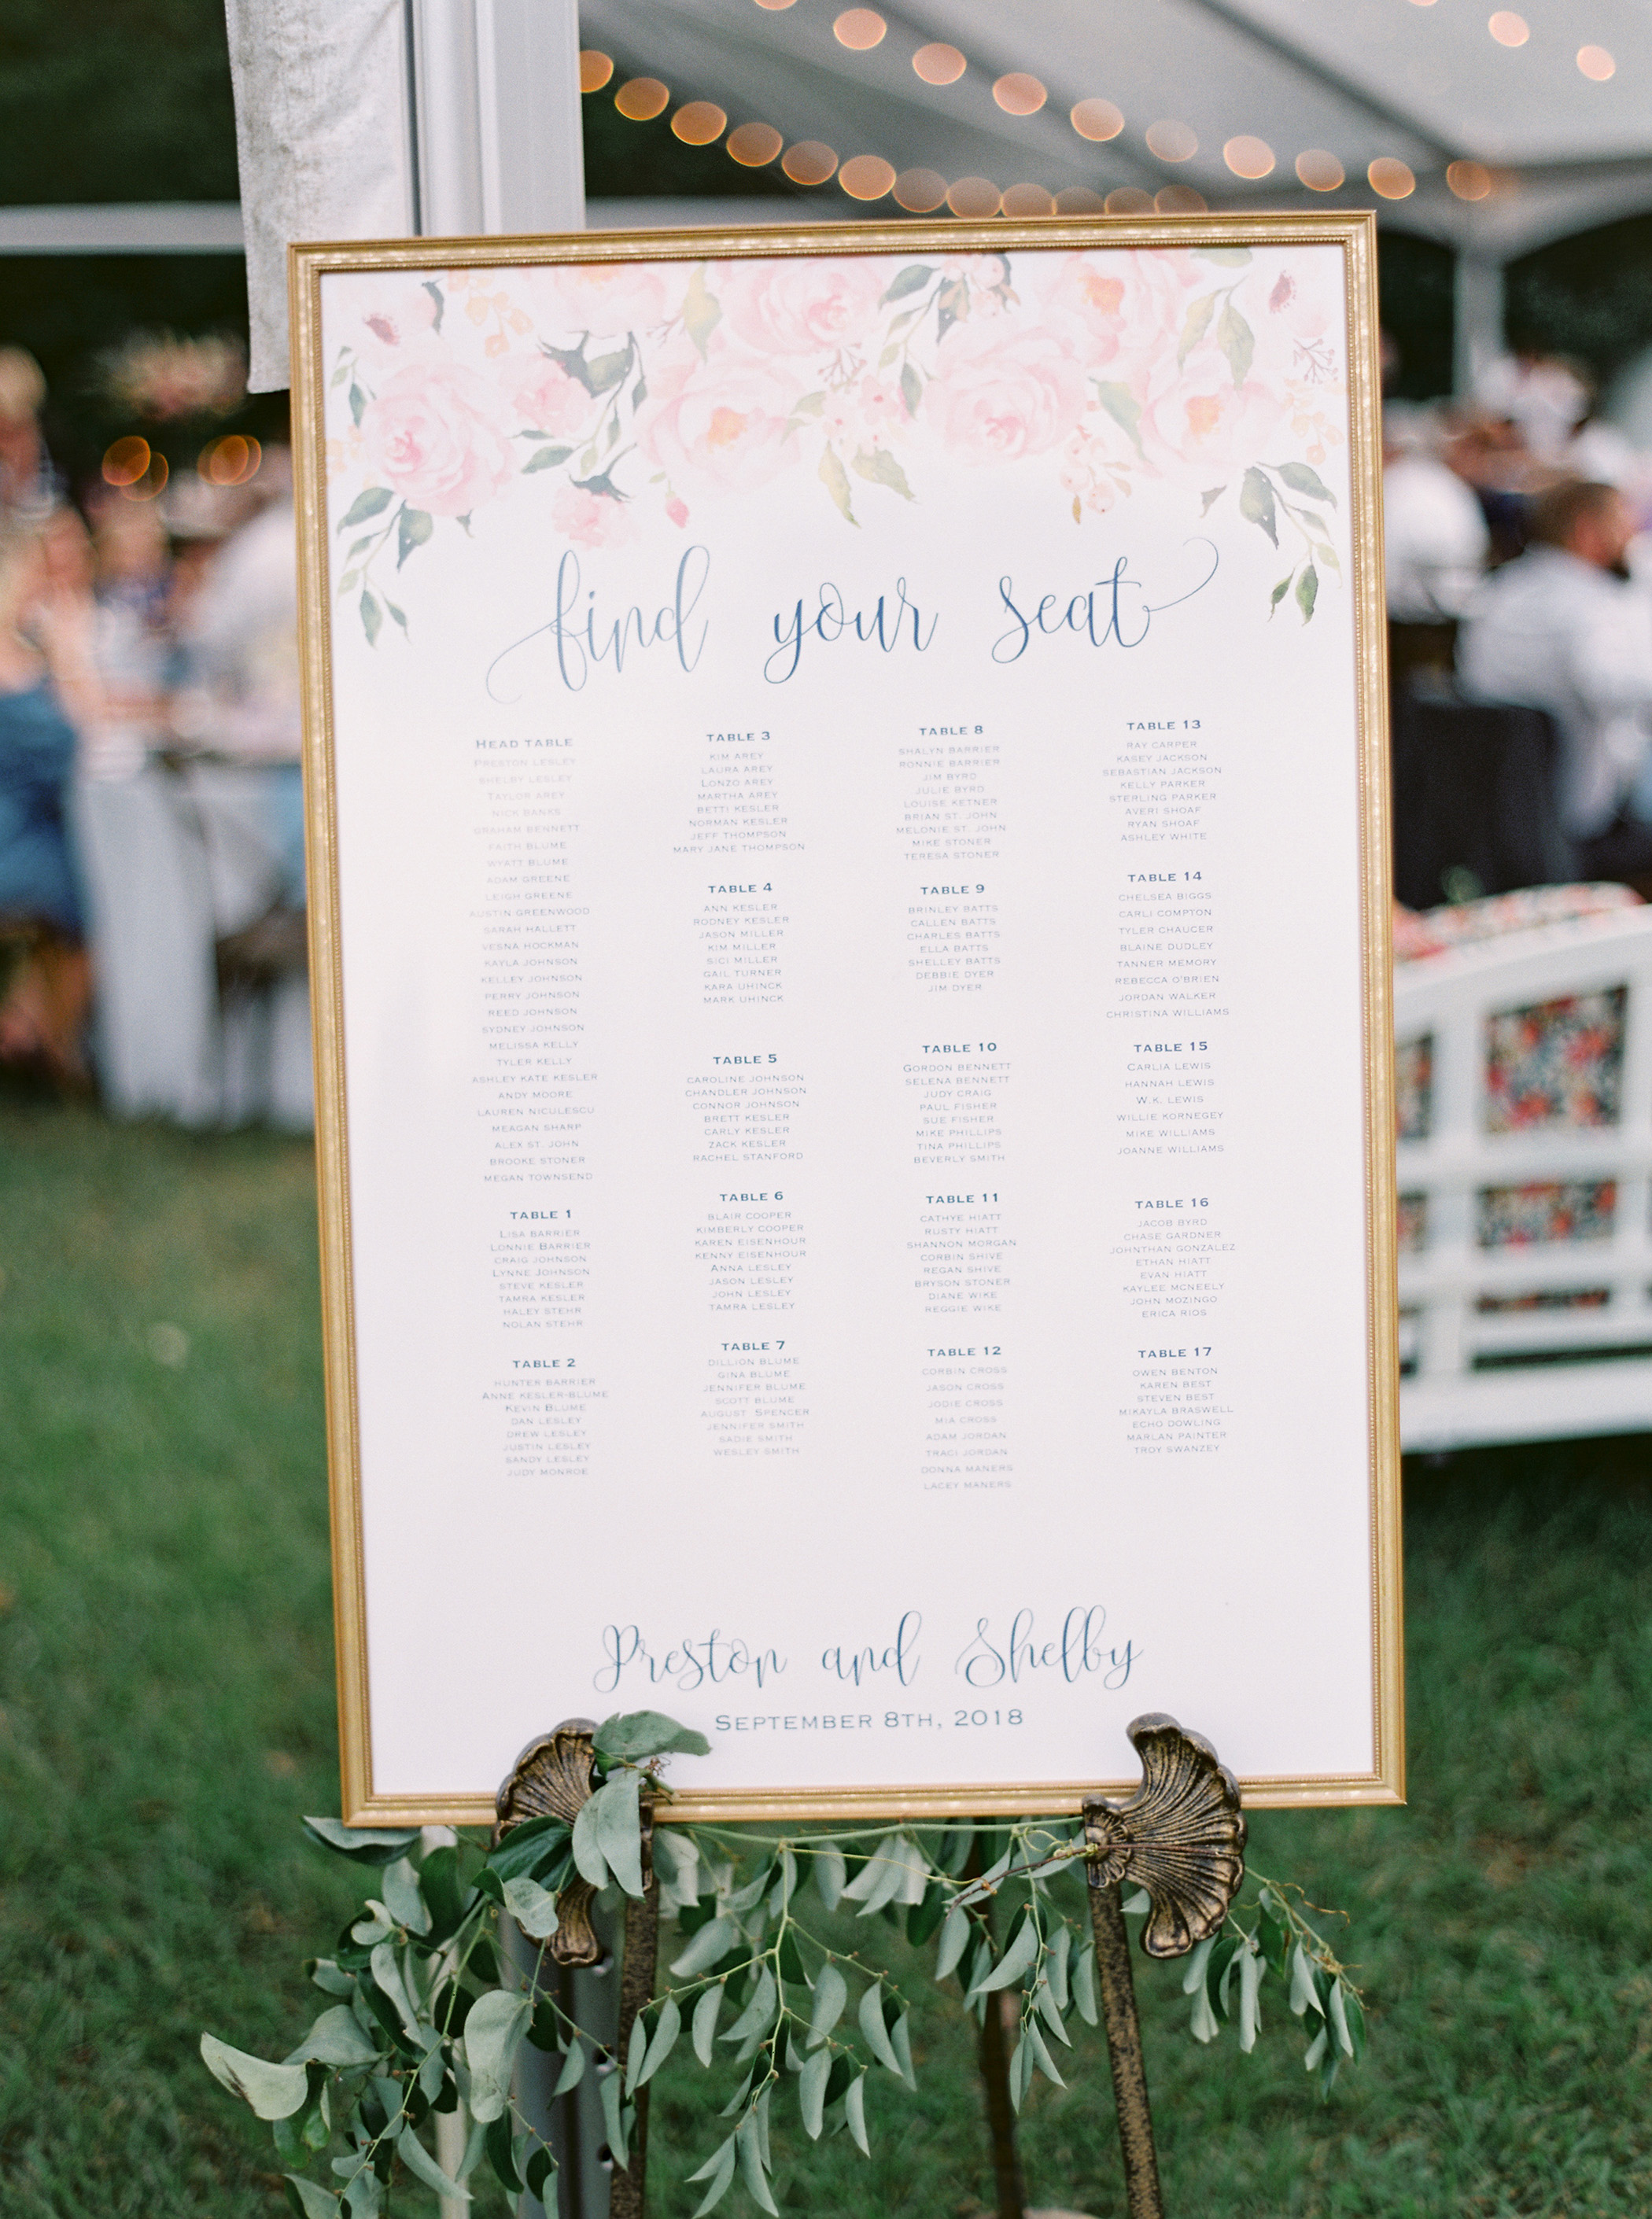 shelby preston wedding seating chart